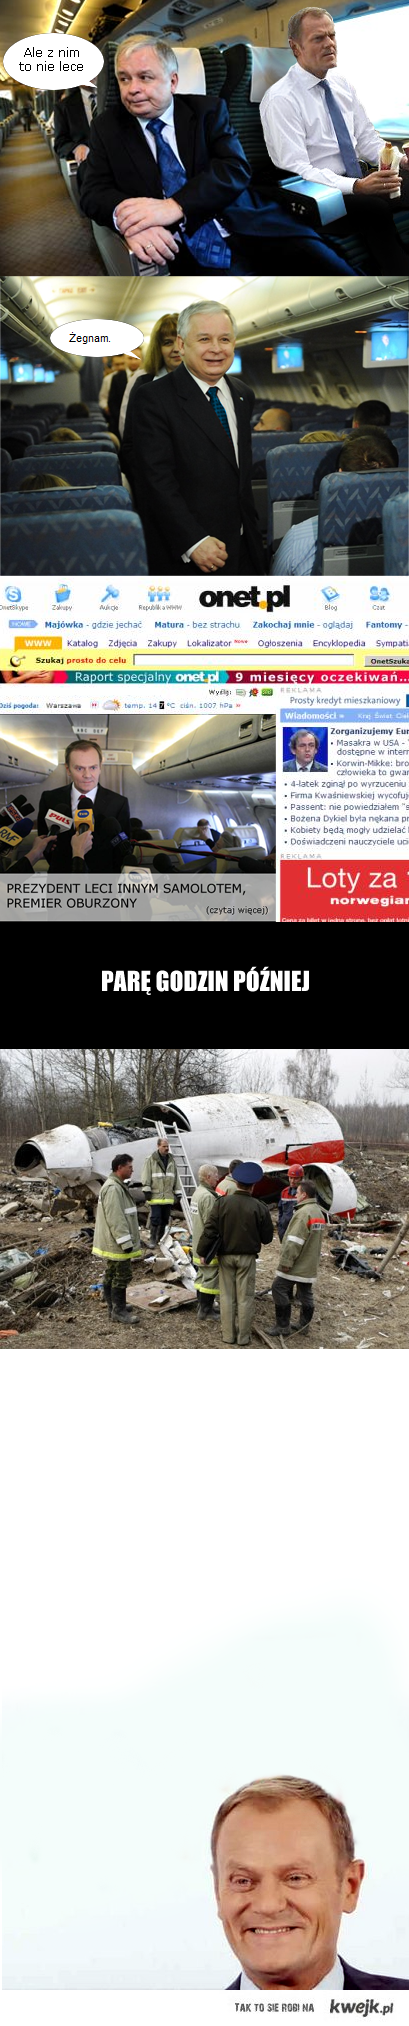 Prawda Smoleńska